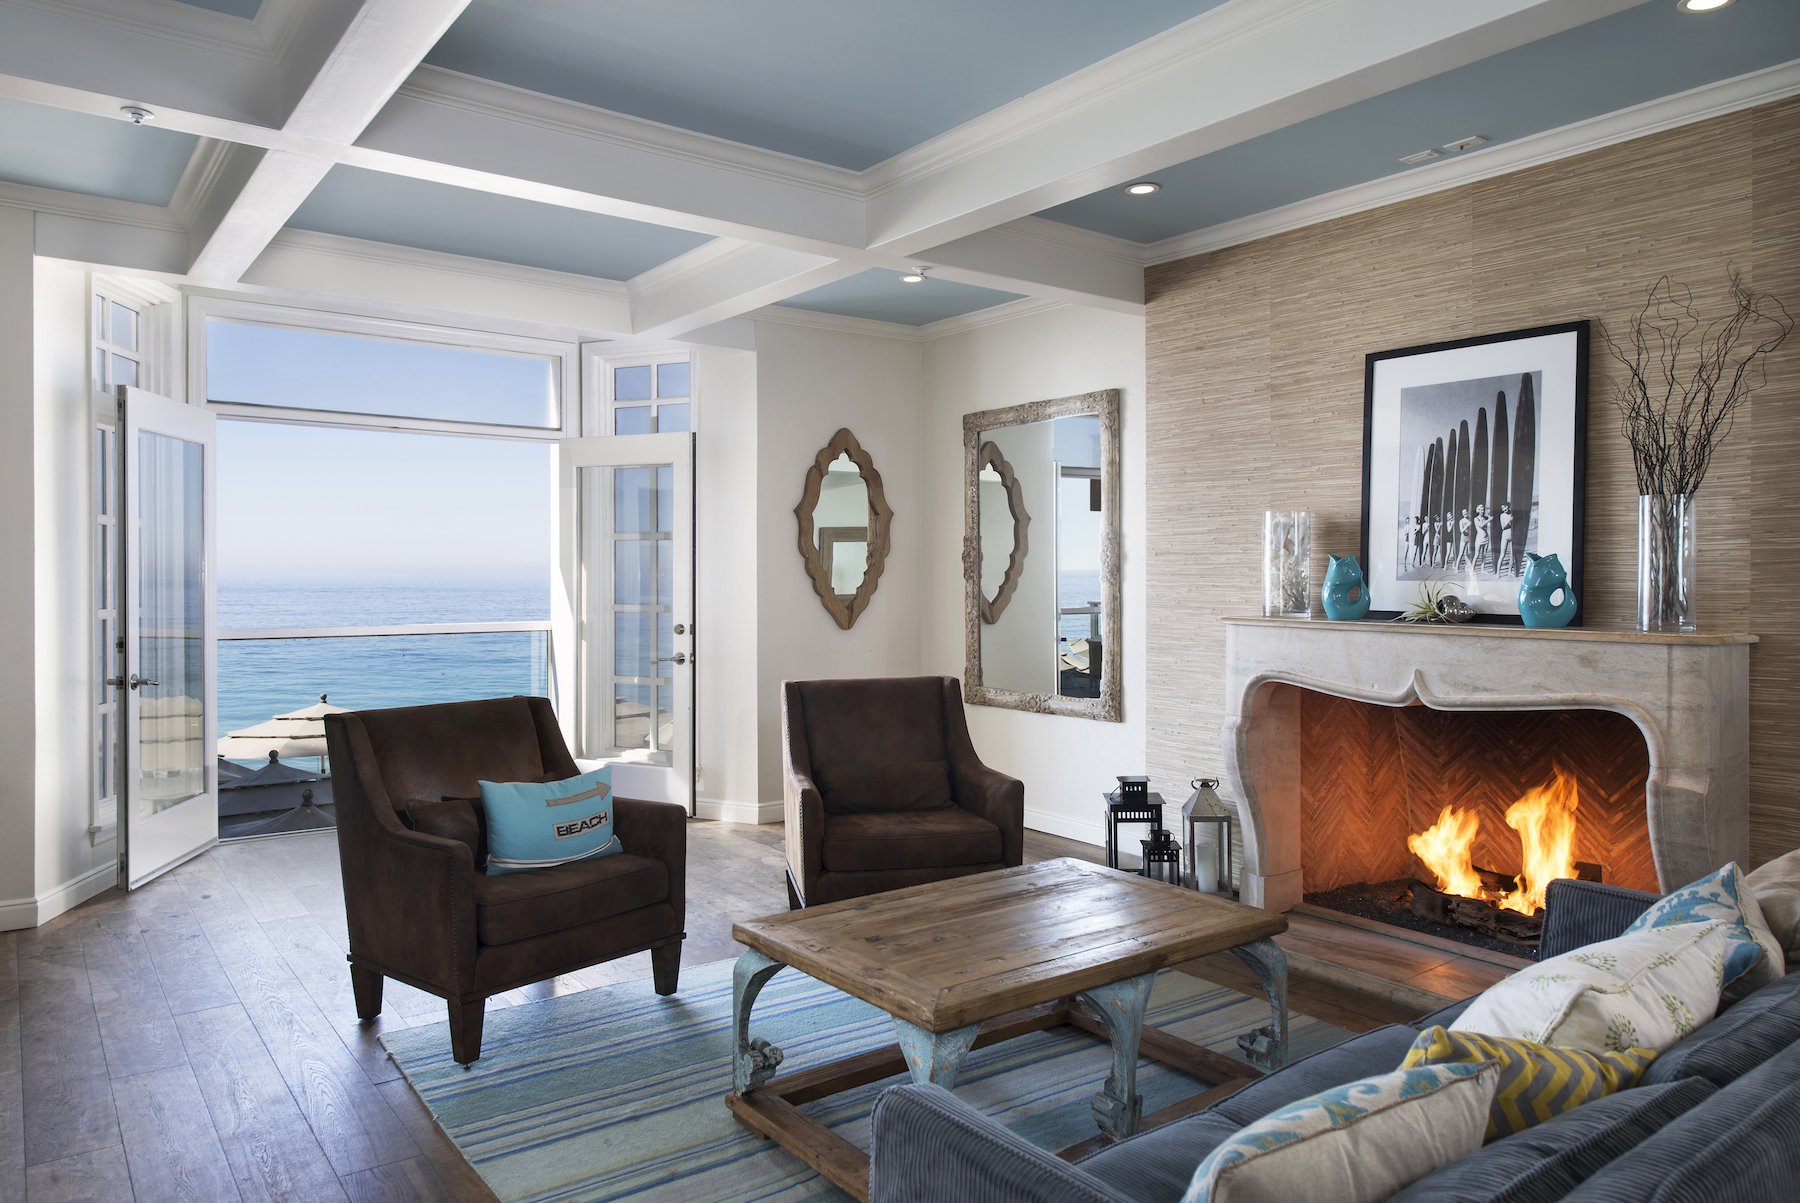 Pacific-Edge-Hotel-Laguna-Beach-Living-Room.jpg